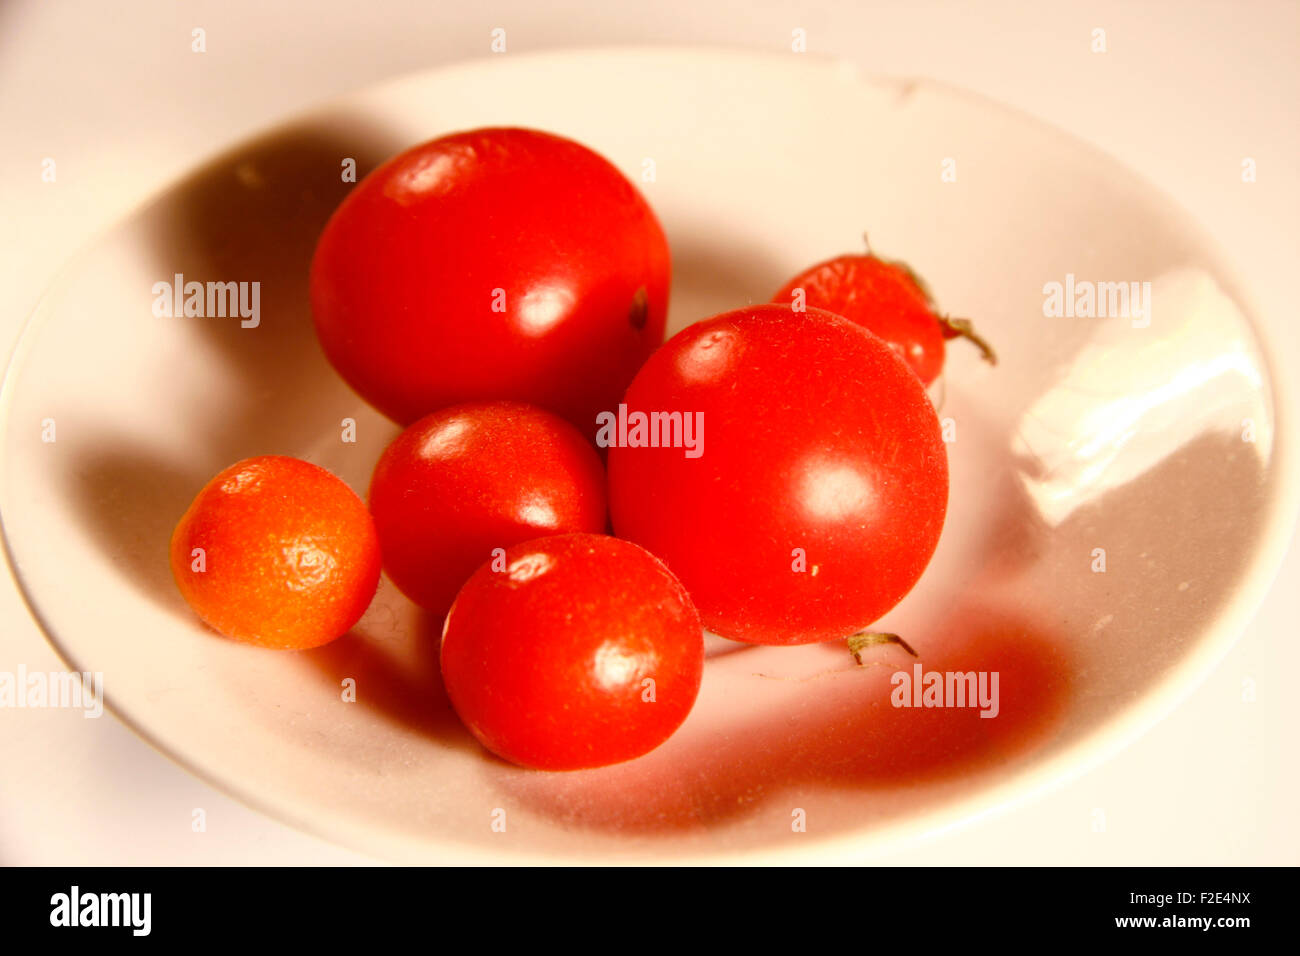 Cherry-Tomaten - Symbolbild Nahrungsmittel. Stock Photo